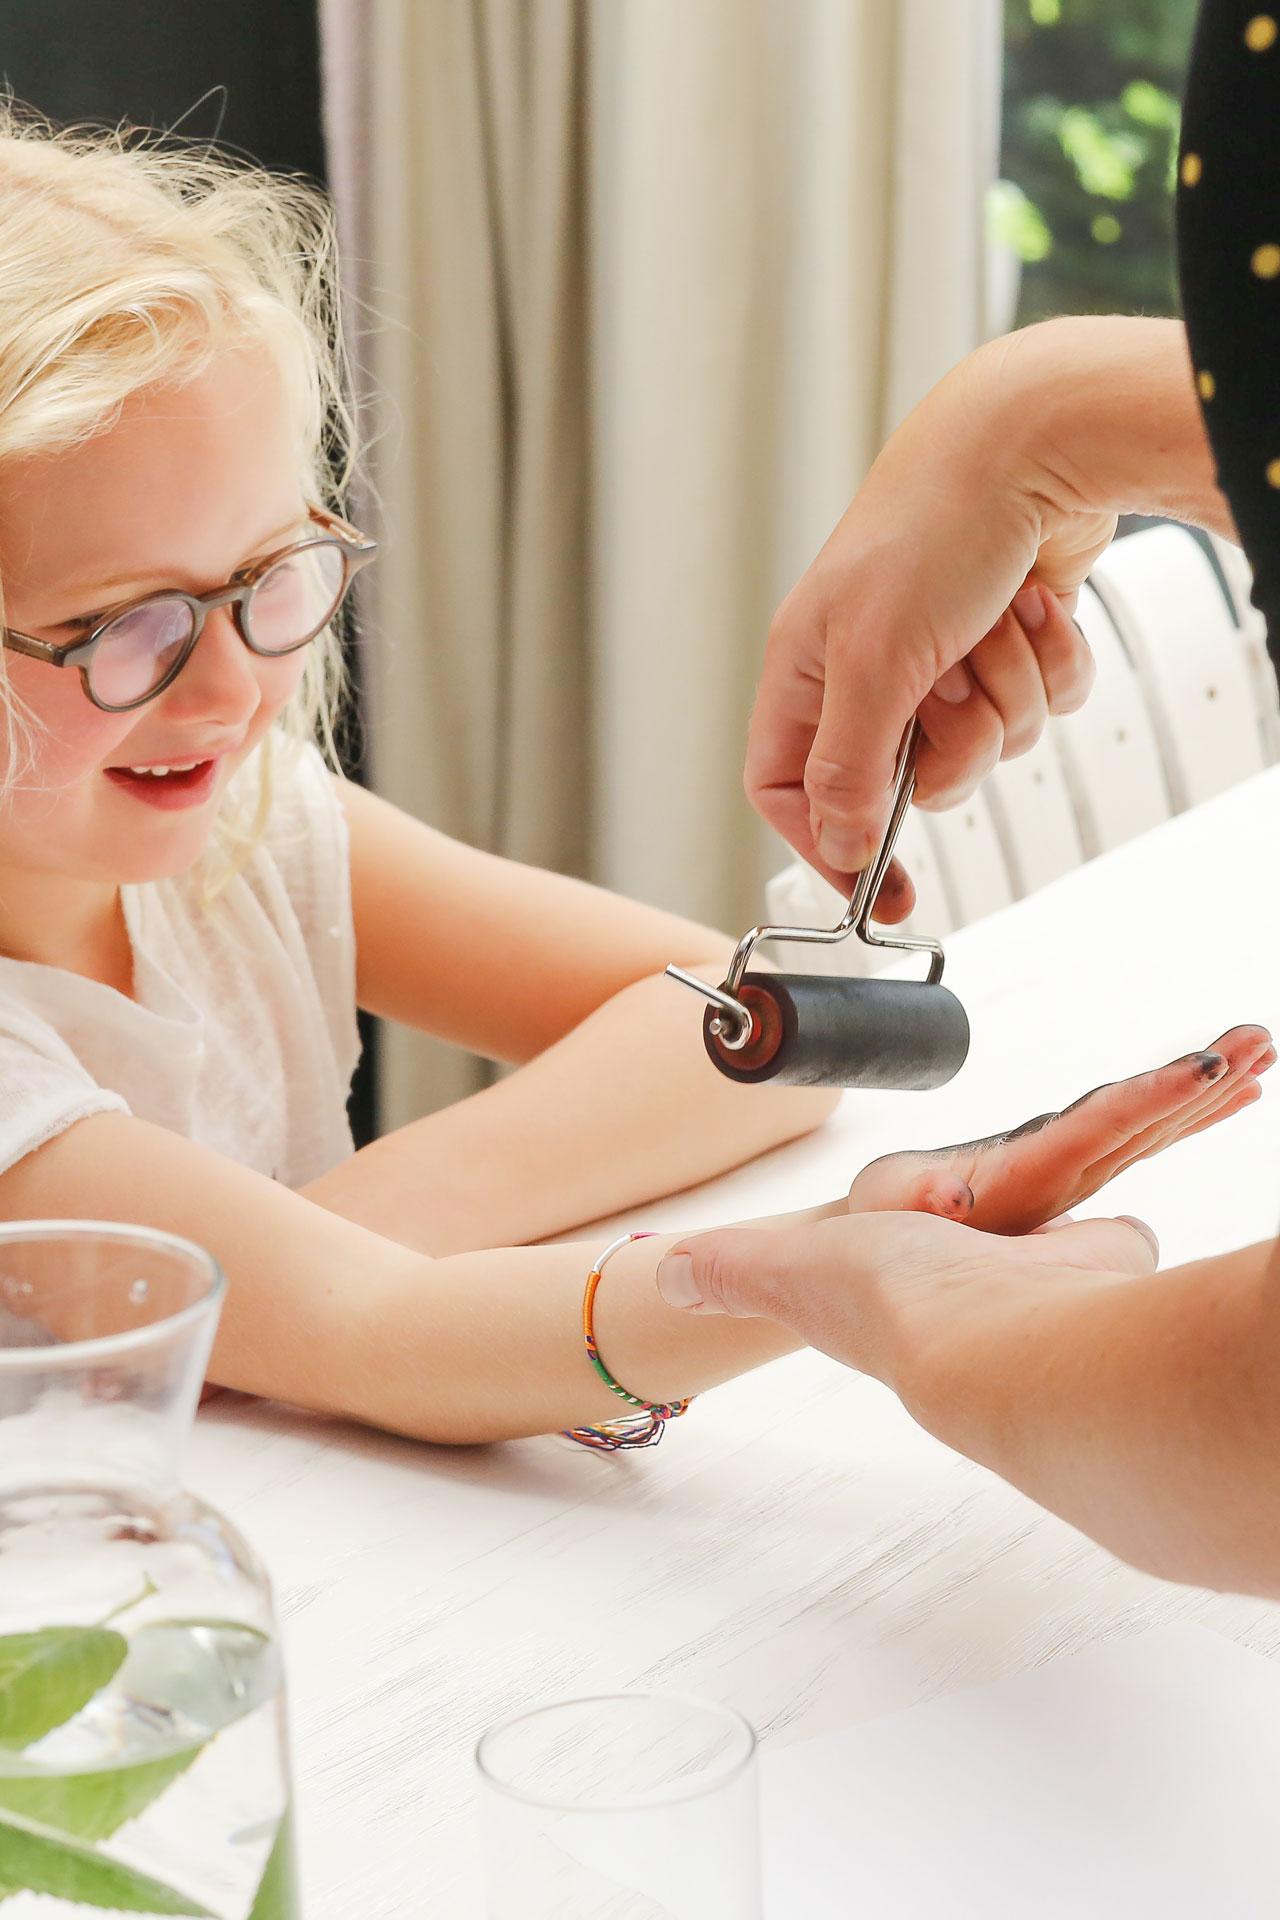 Suzan Broersen - Handlijnkunde - Consult kind & ouder